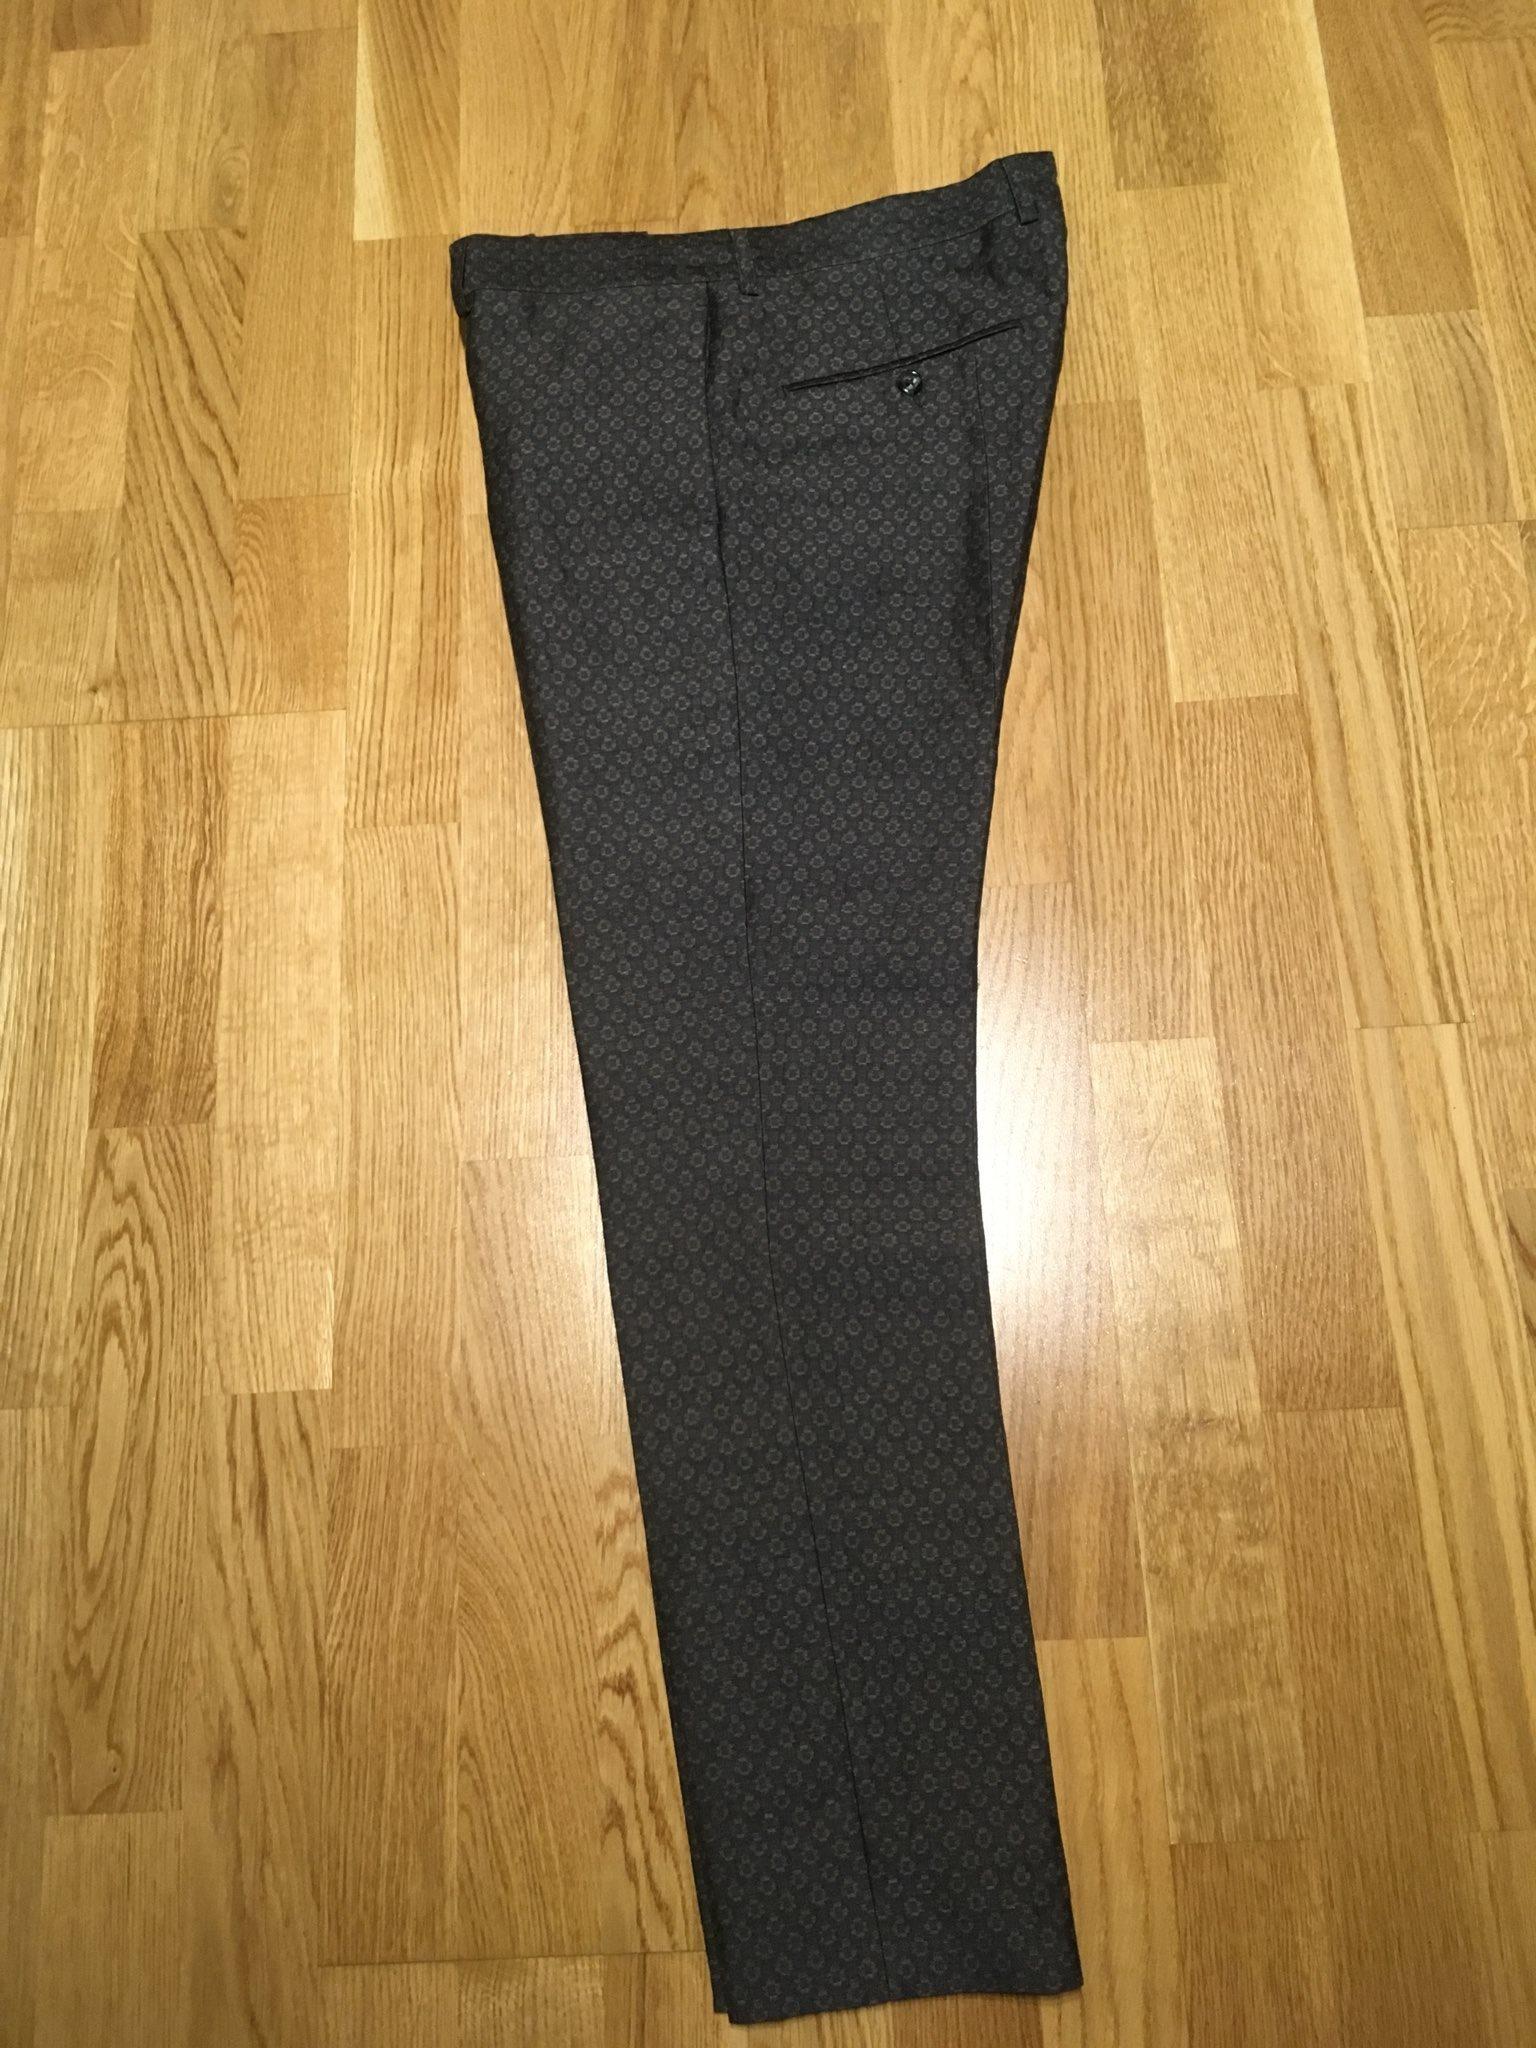 J Lindeberg byxor slim fit (331117818) ᐈ Köp på Tradera 5e6daa938c41d